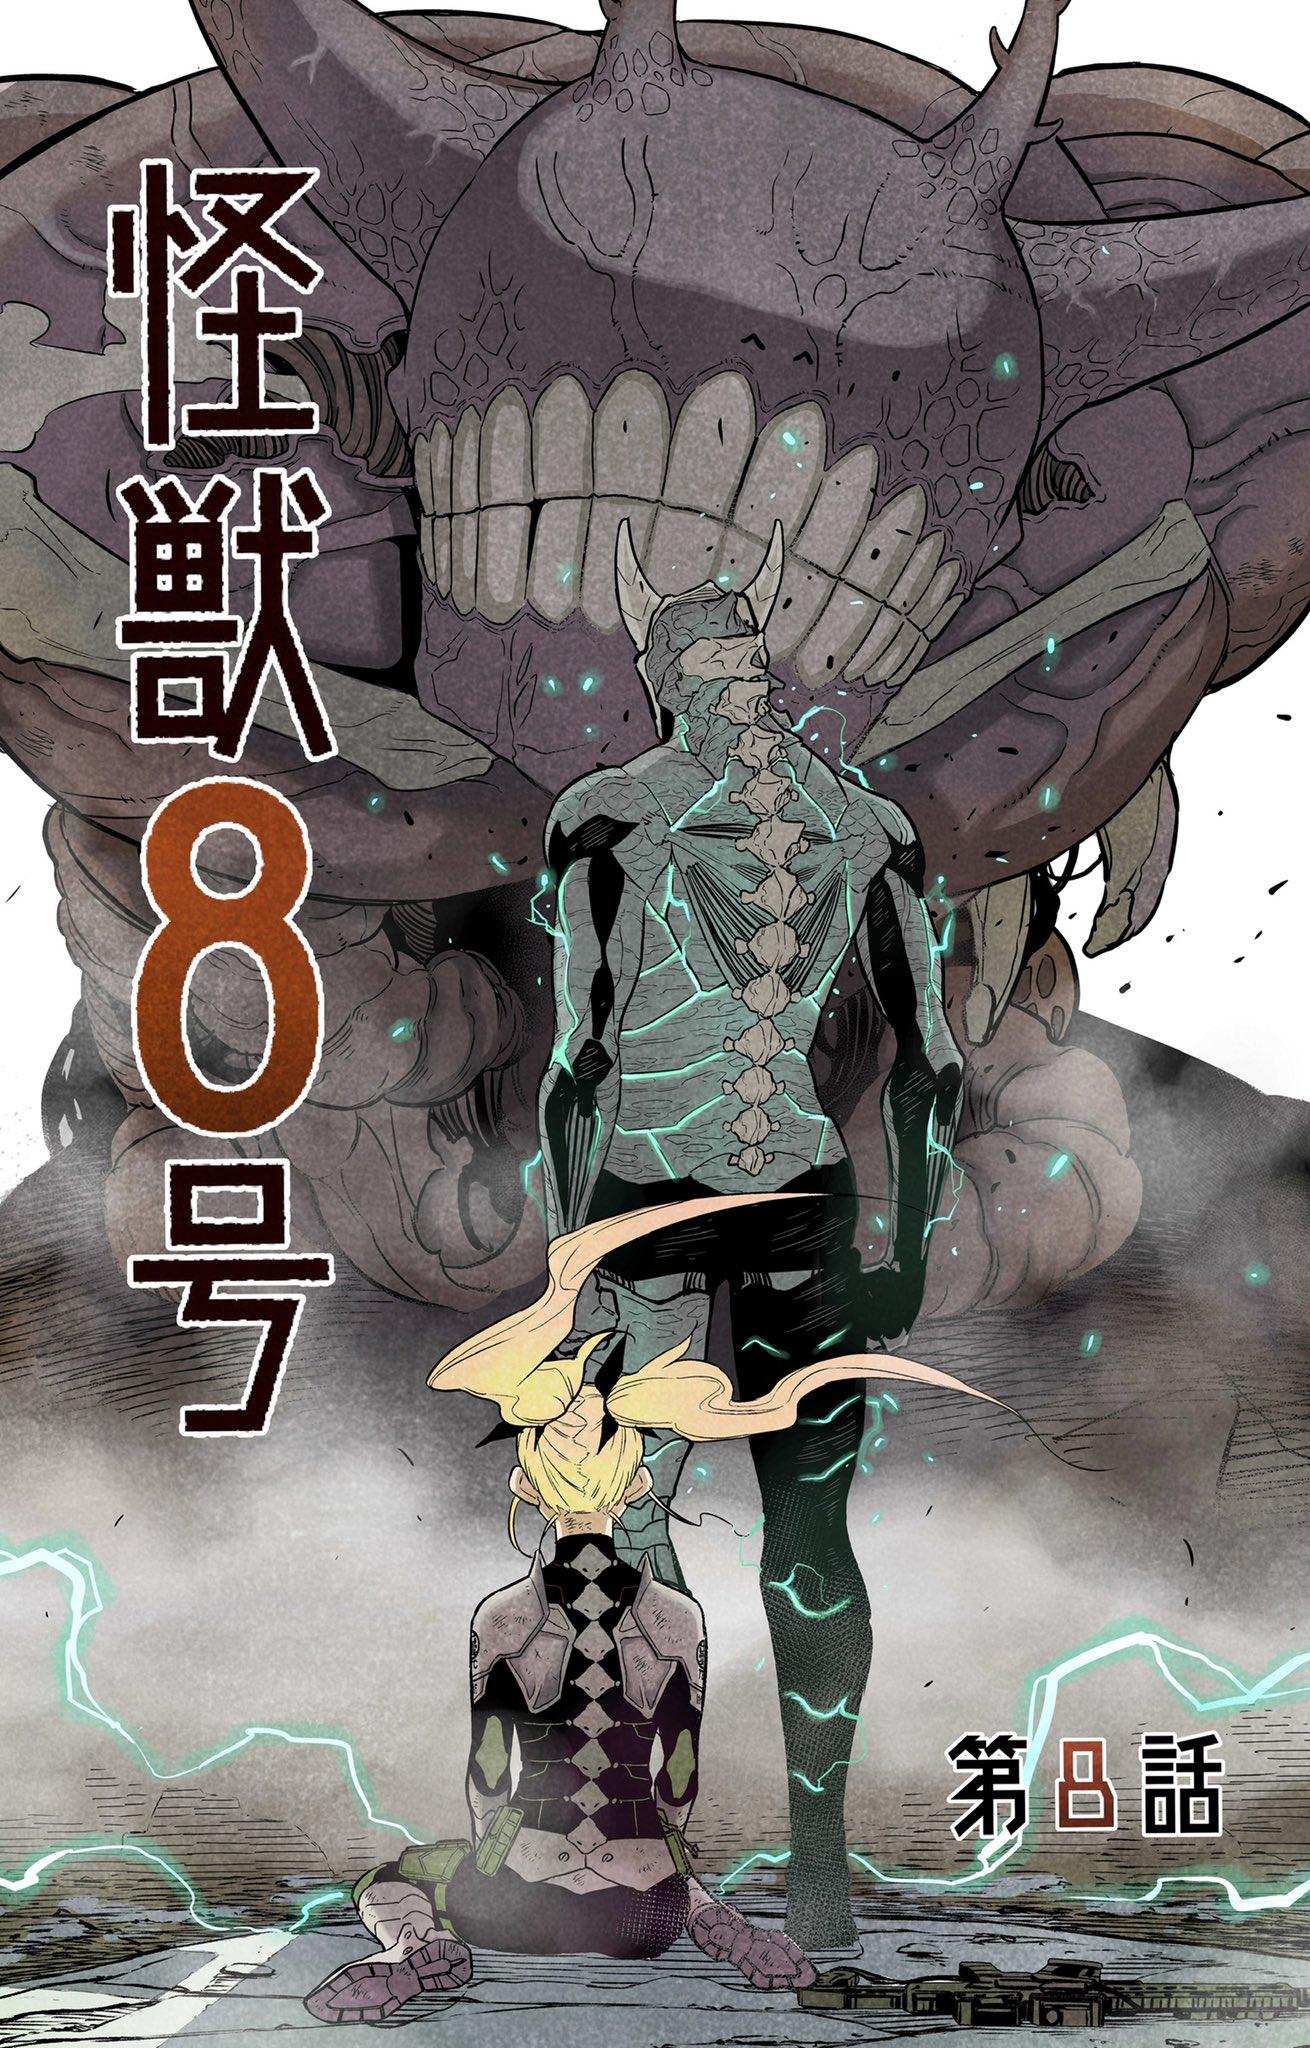 Kaiju No 8 Chapter 28